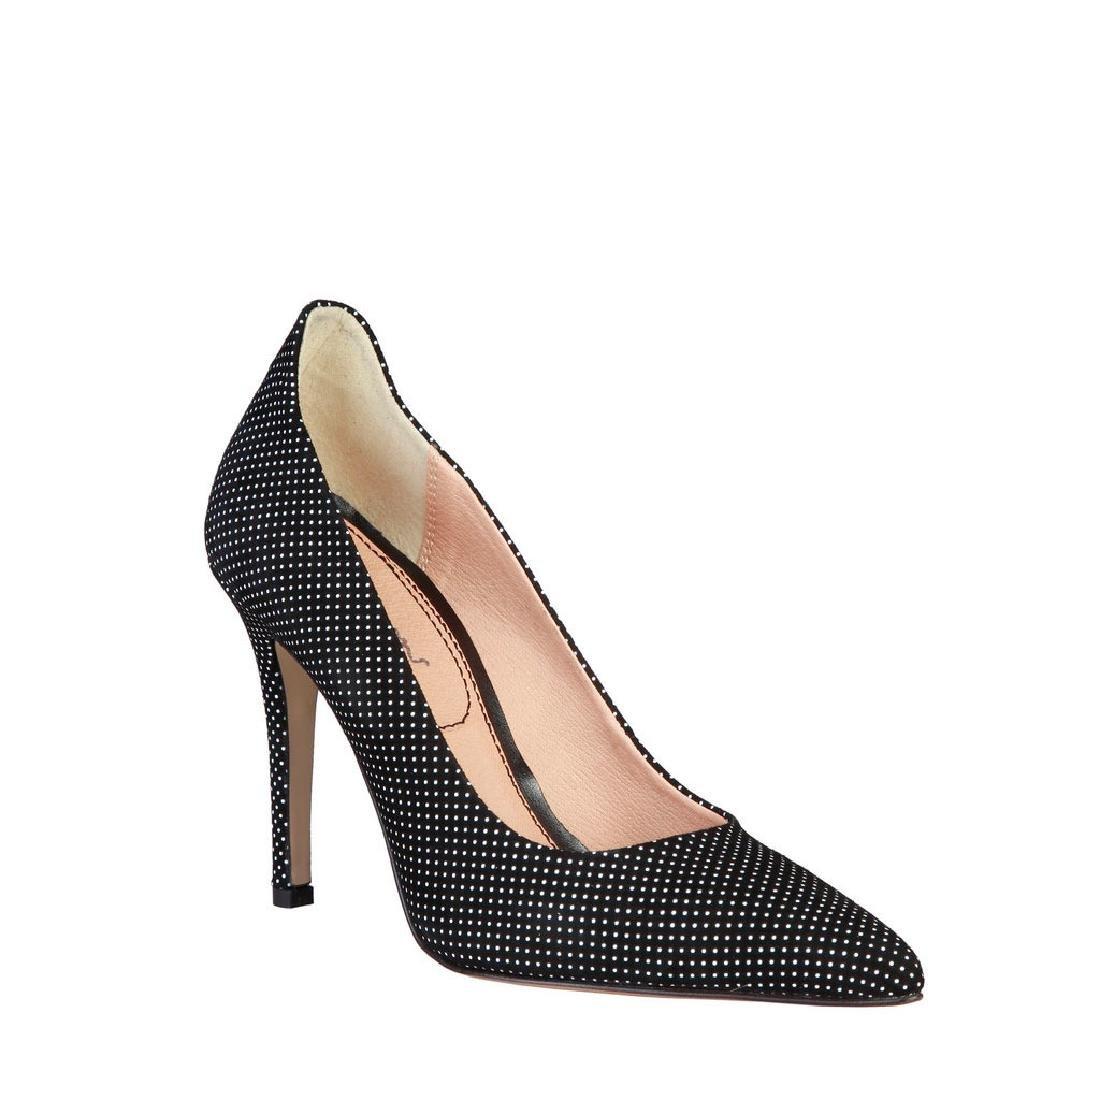 New Women's Pierre Cardin High Heel Pumps Shoes US 8.5 - 3